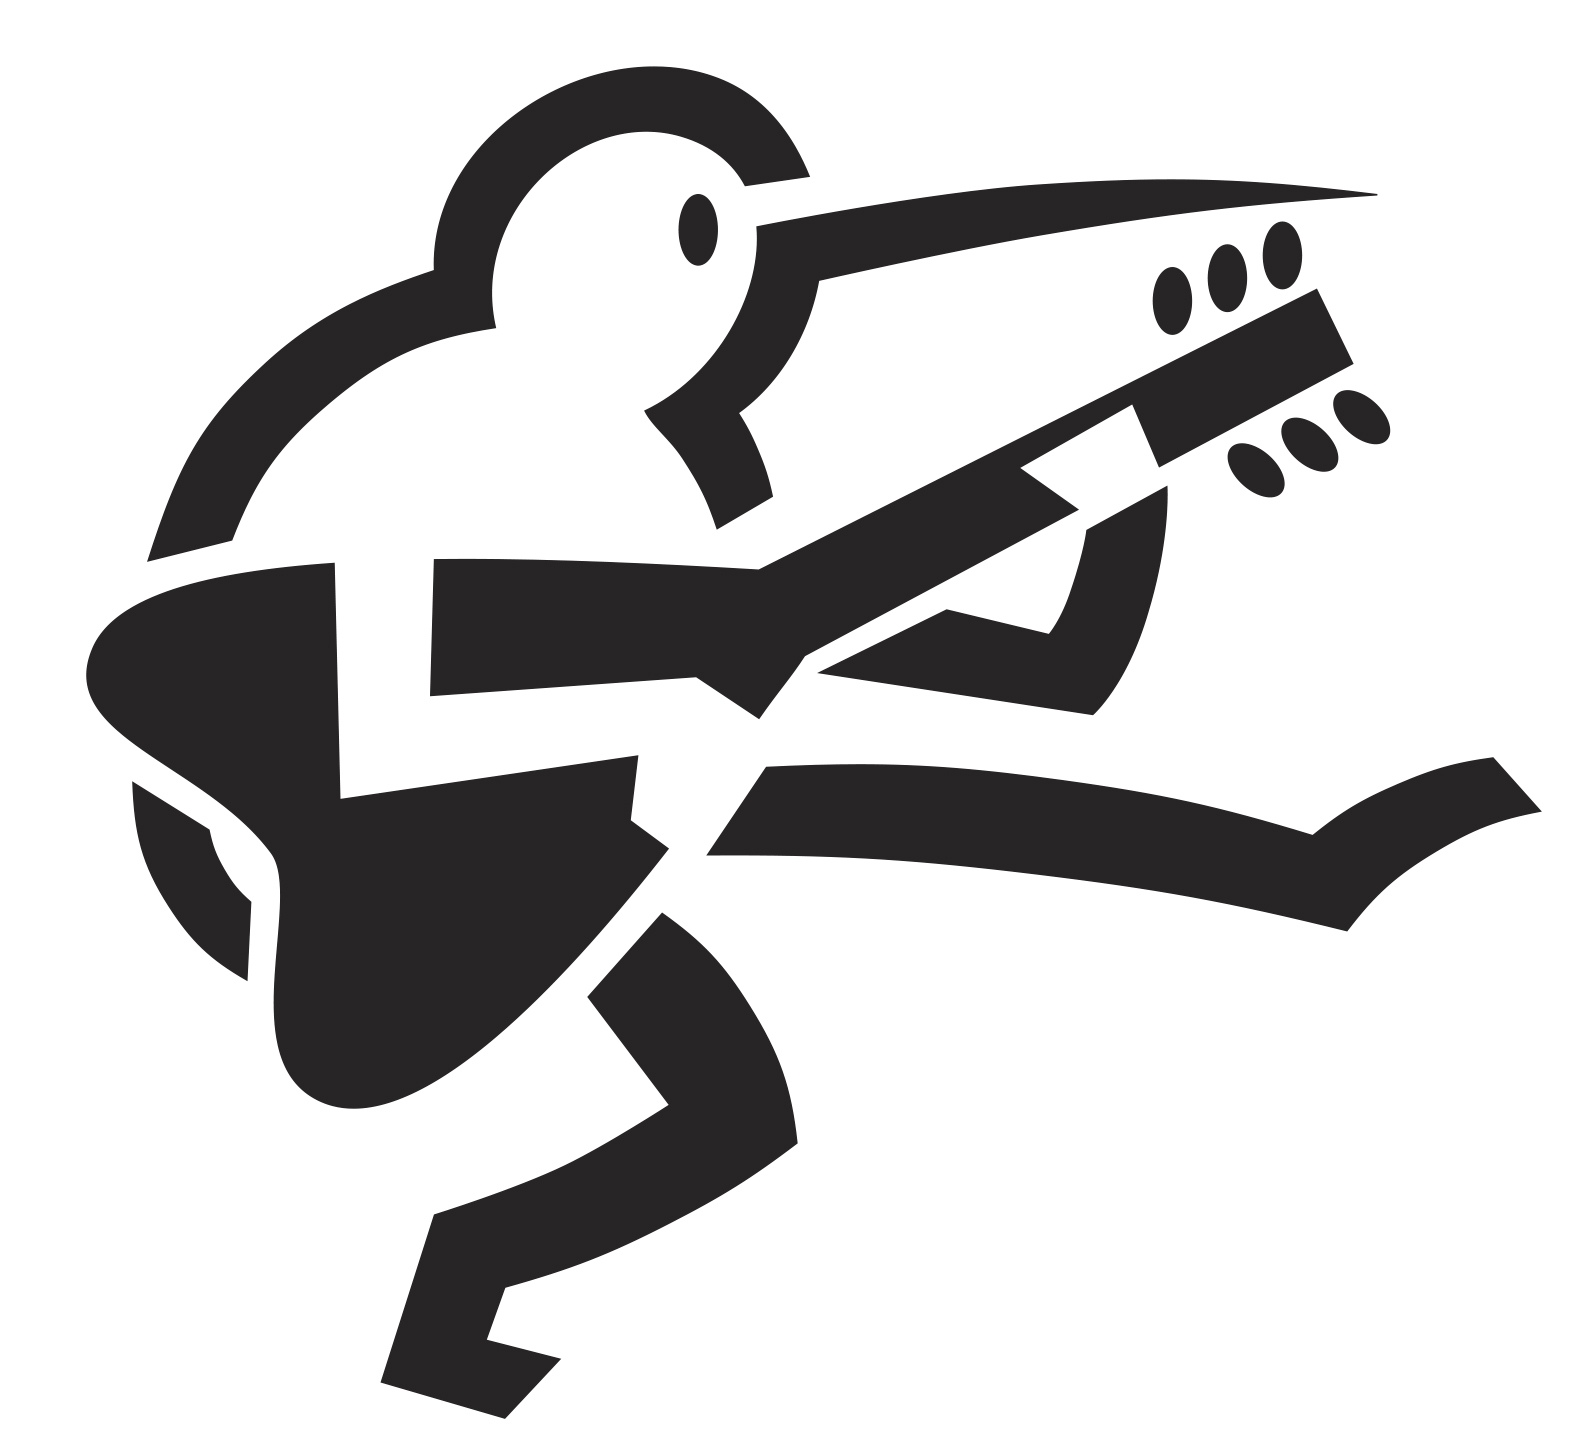 Kiwi Rock logo.jpg